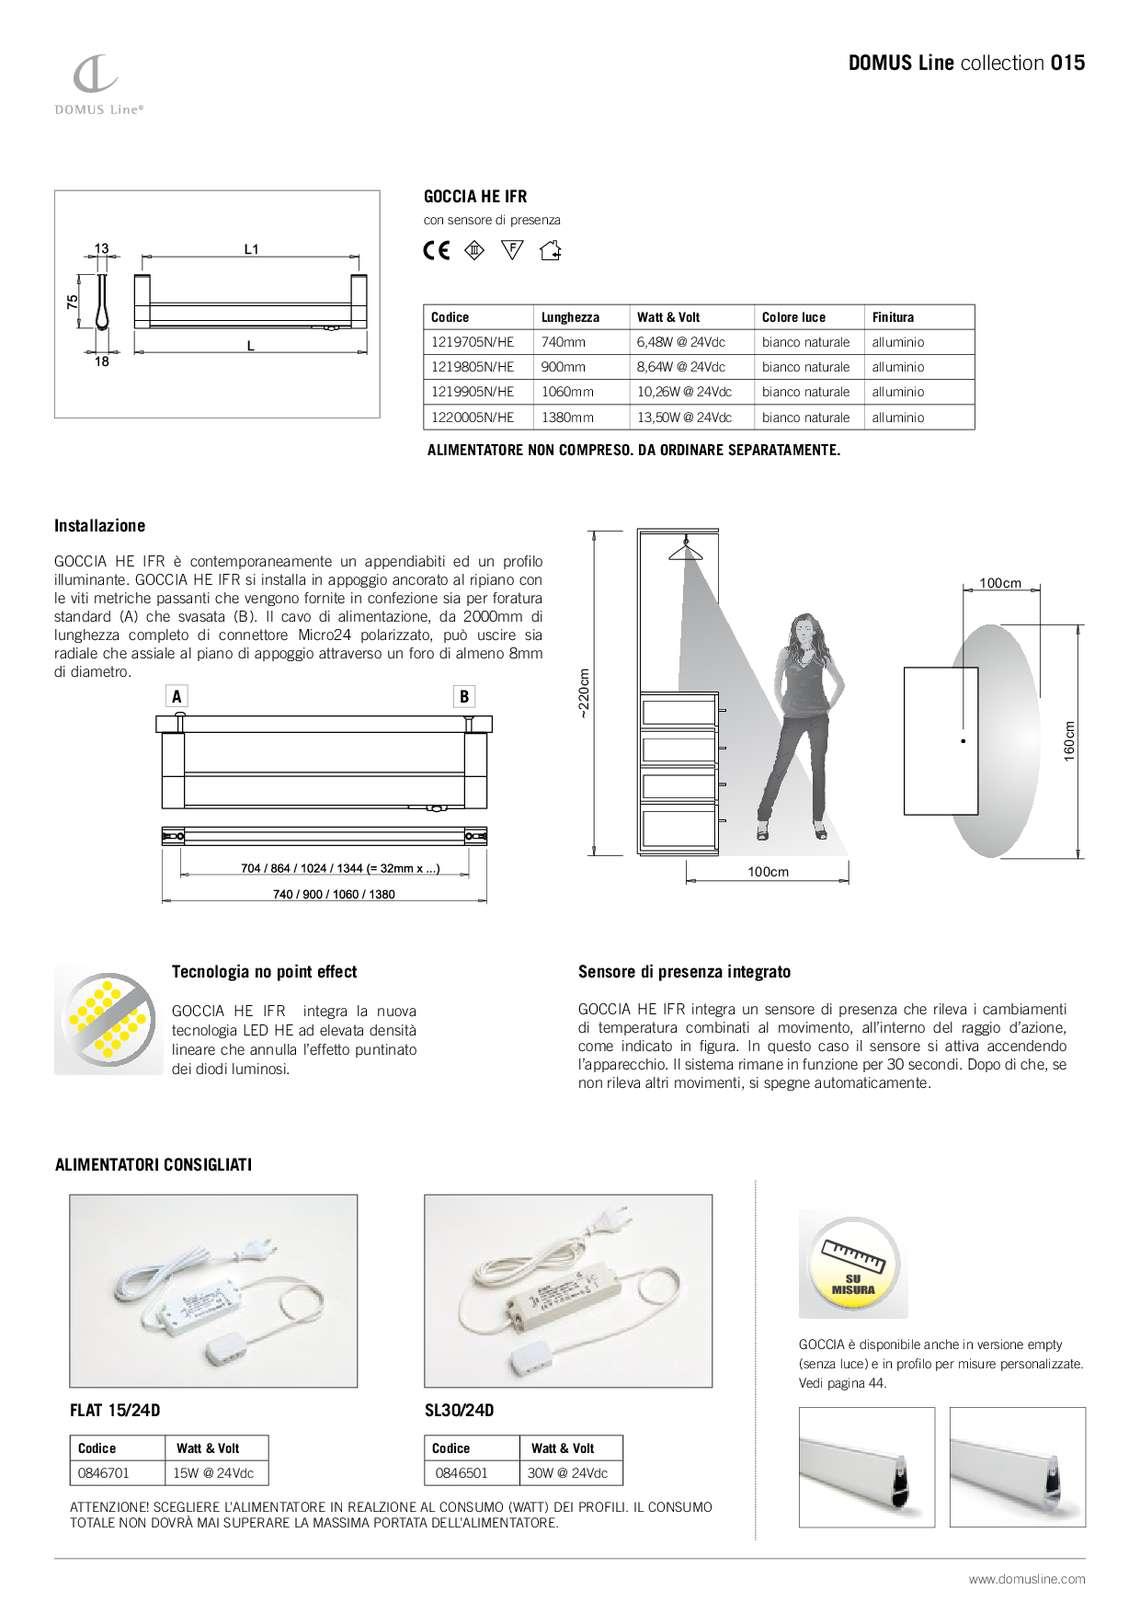 domus-line-illuminazione_26_015.jpg